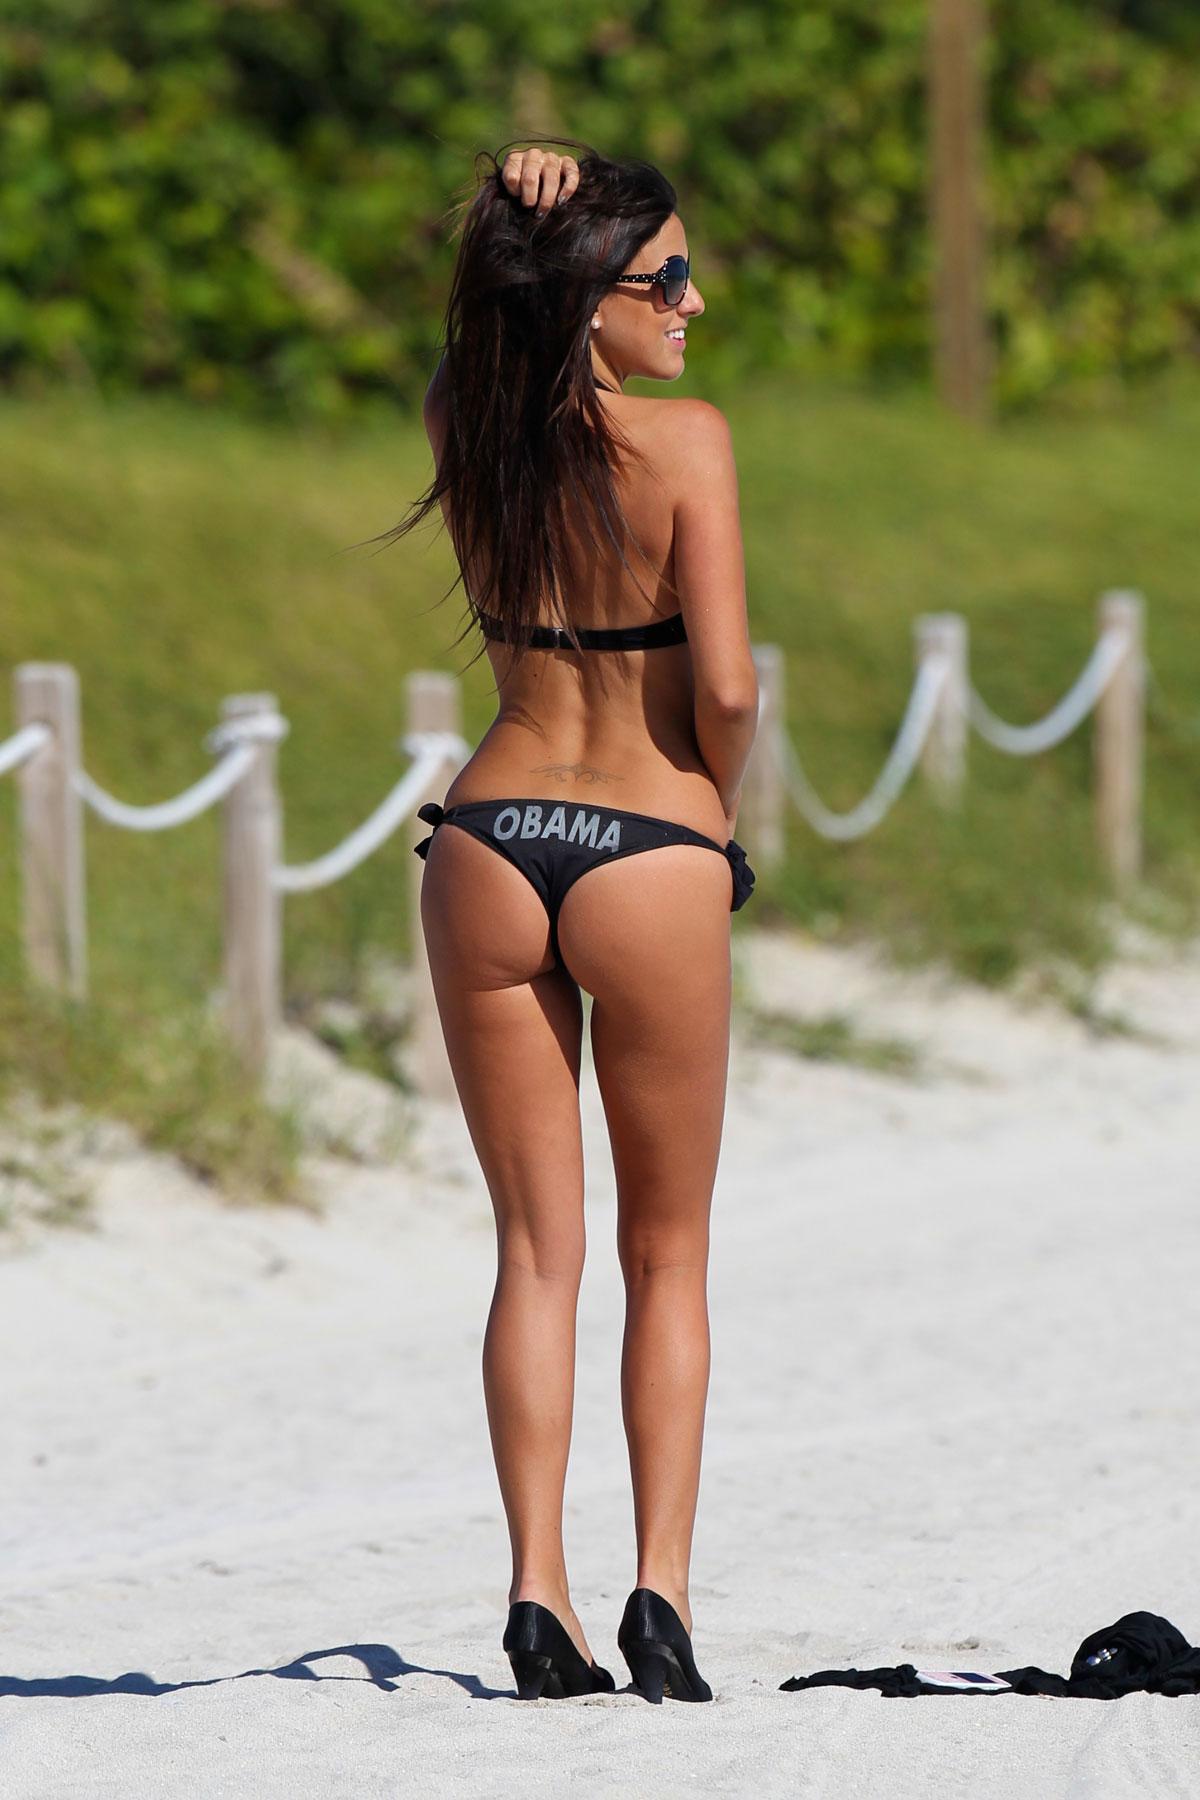 Zishy Adriene Macedo Hardhdxxx Thong Bikini Vk Thong Bikini Amateur